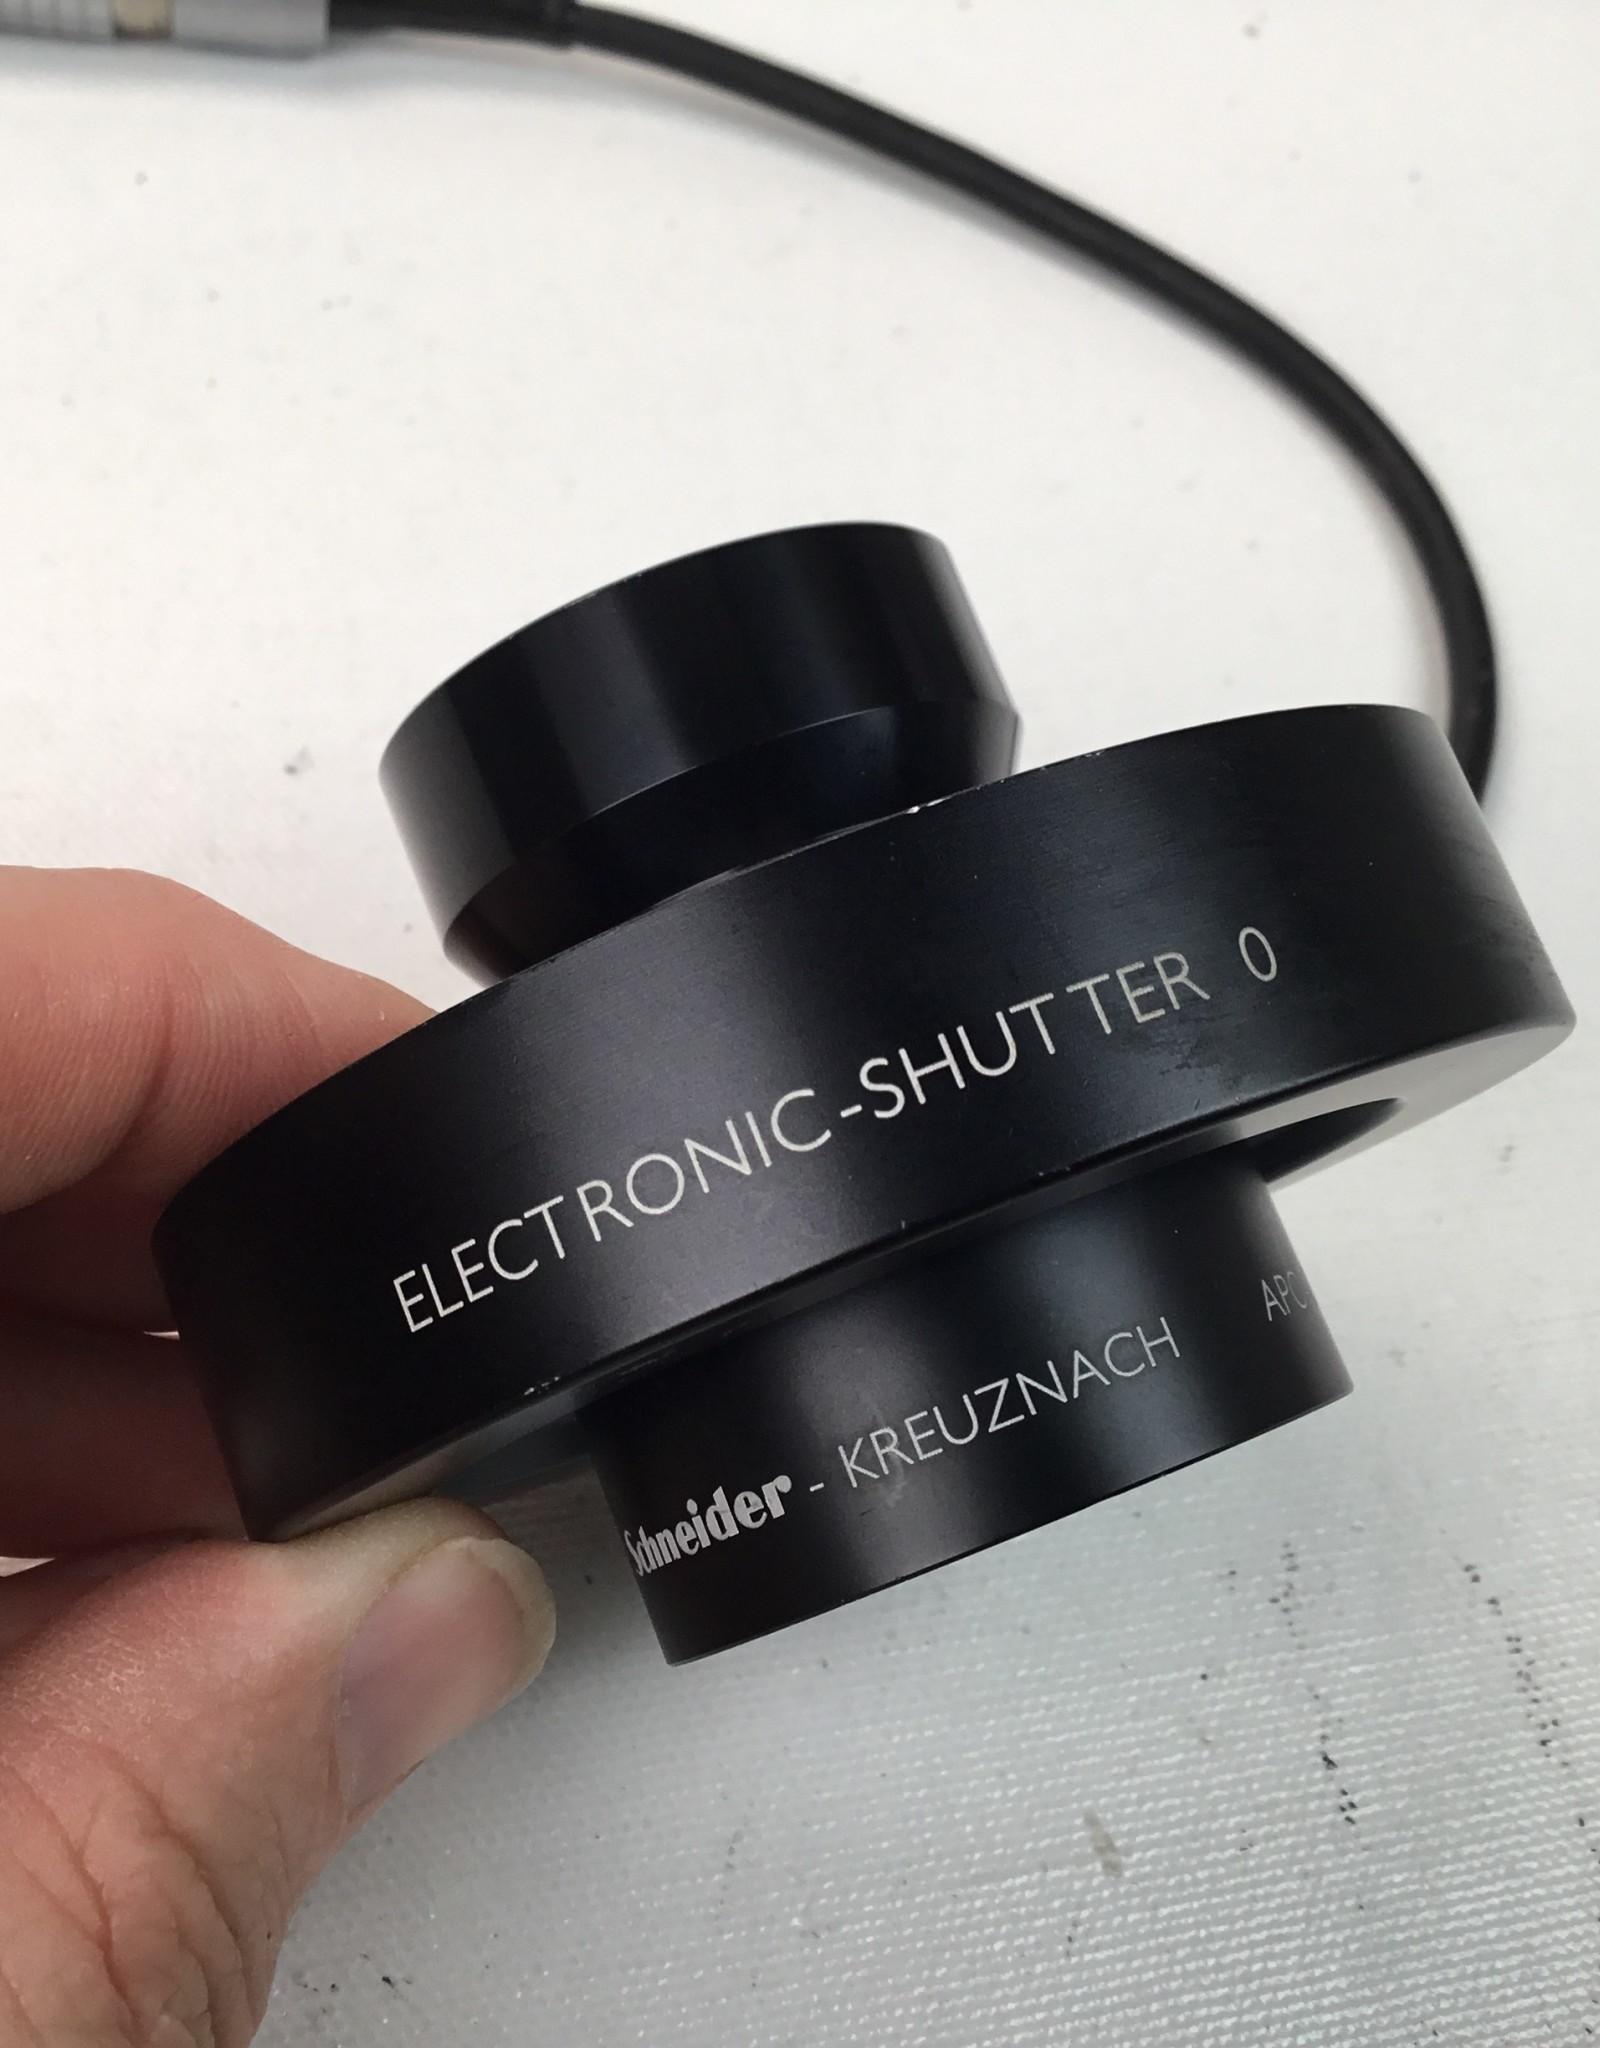 Schneider APO-DIGITAR 120mm f5.6 M-26 MC in Electronic Shutter Used EX